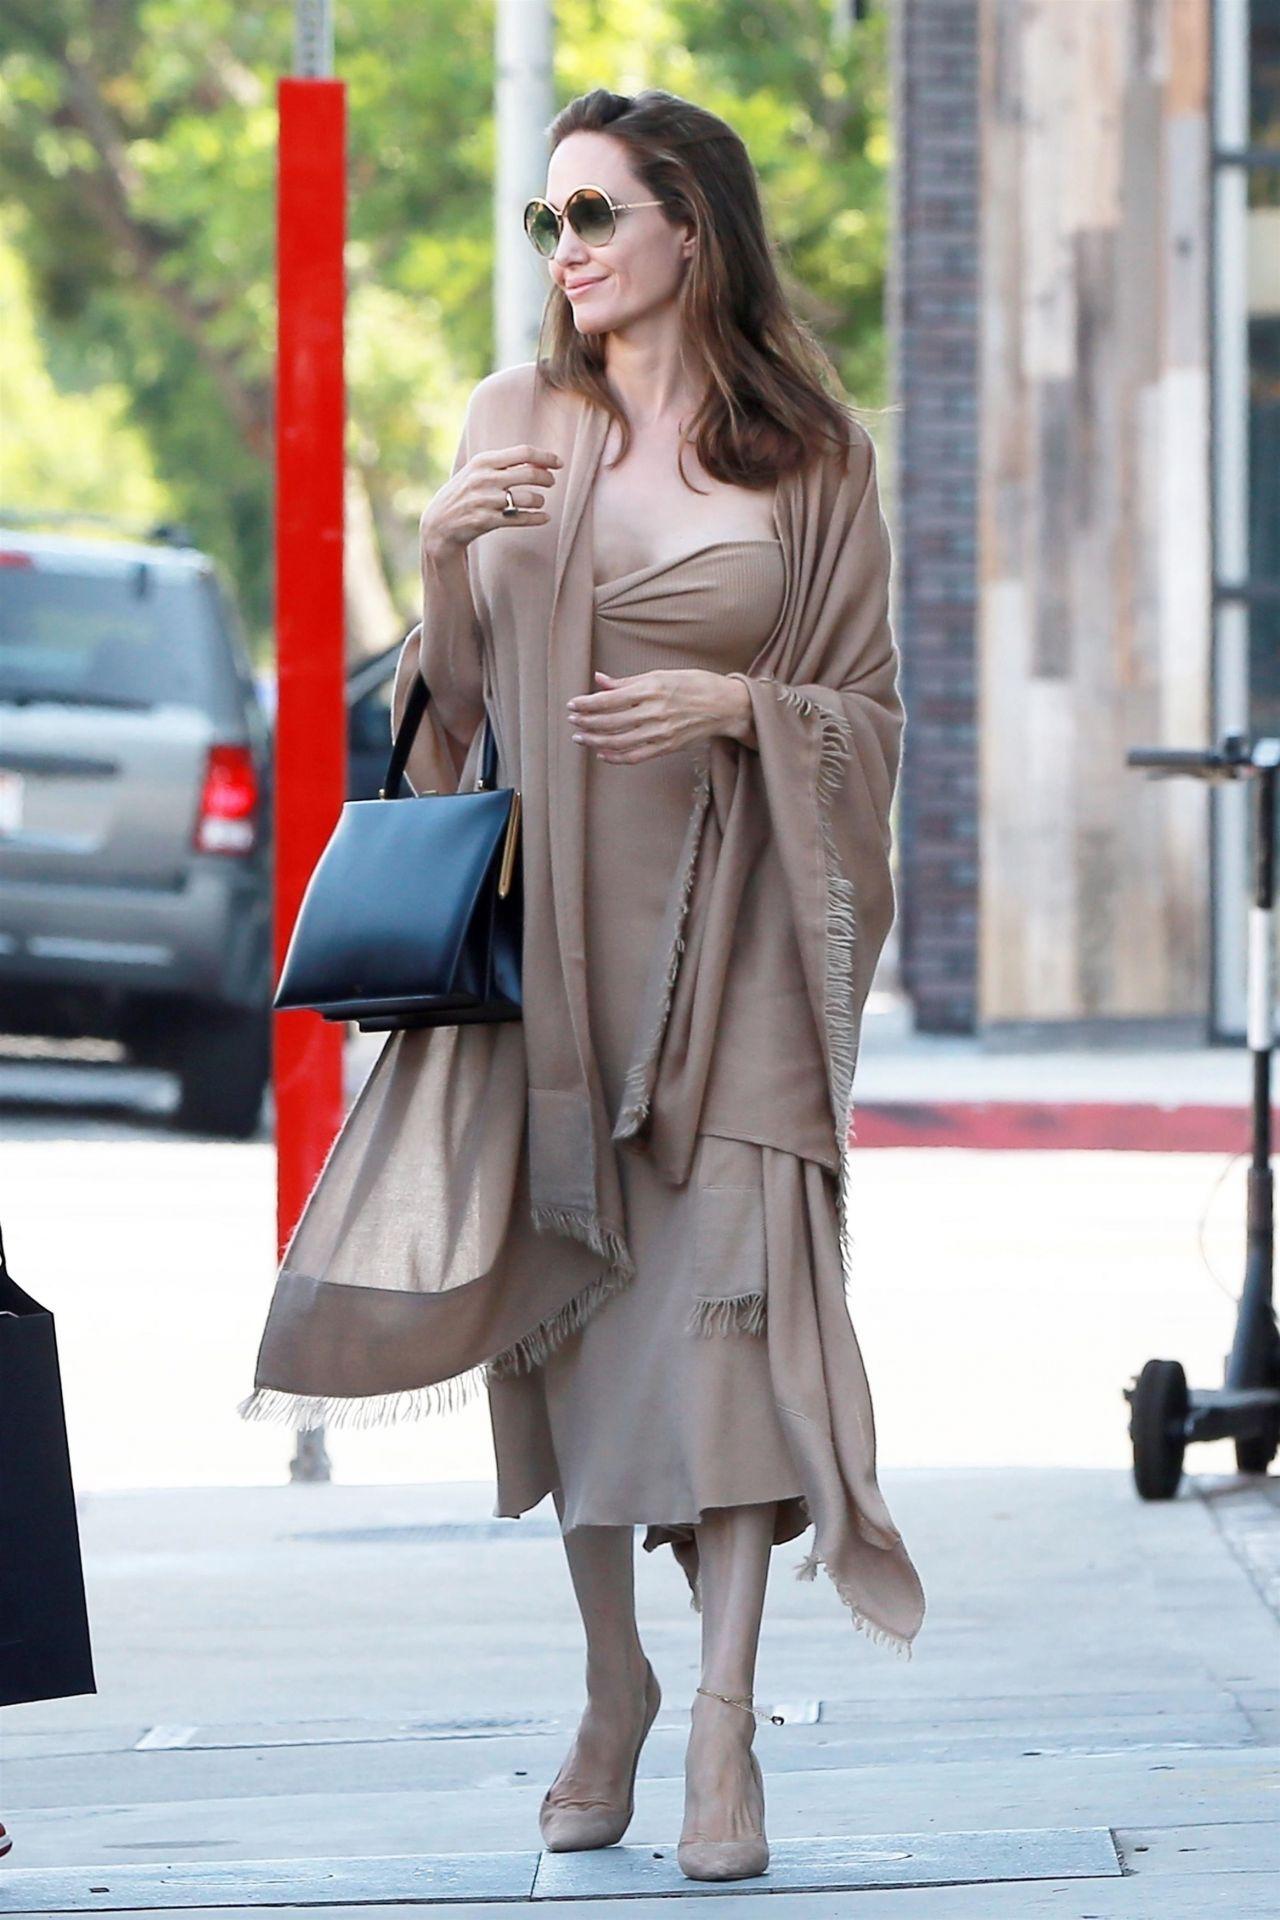 Angelina Jolie at Perch Restaurant in Los Angeles, 08/26/2018 анджелина джоли 2018